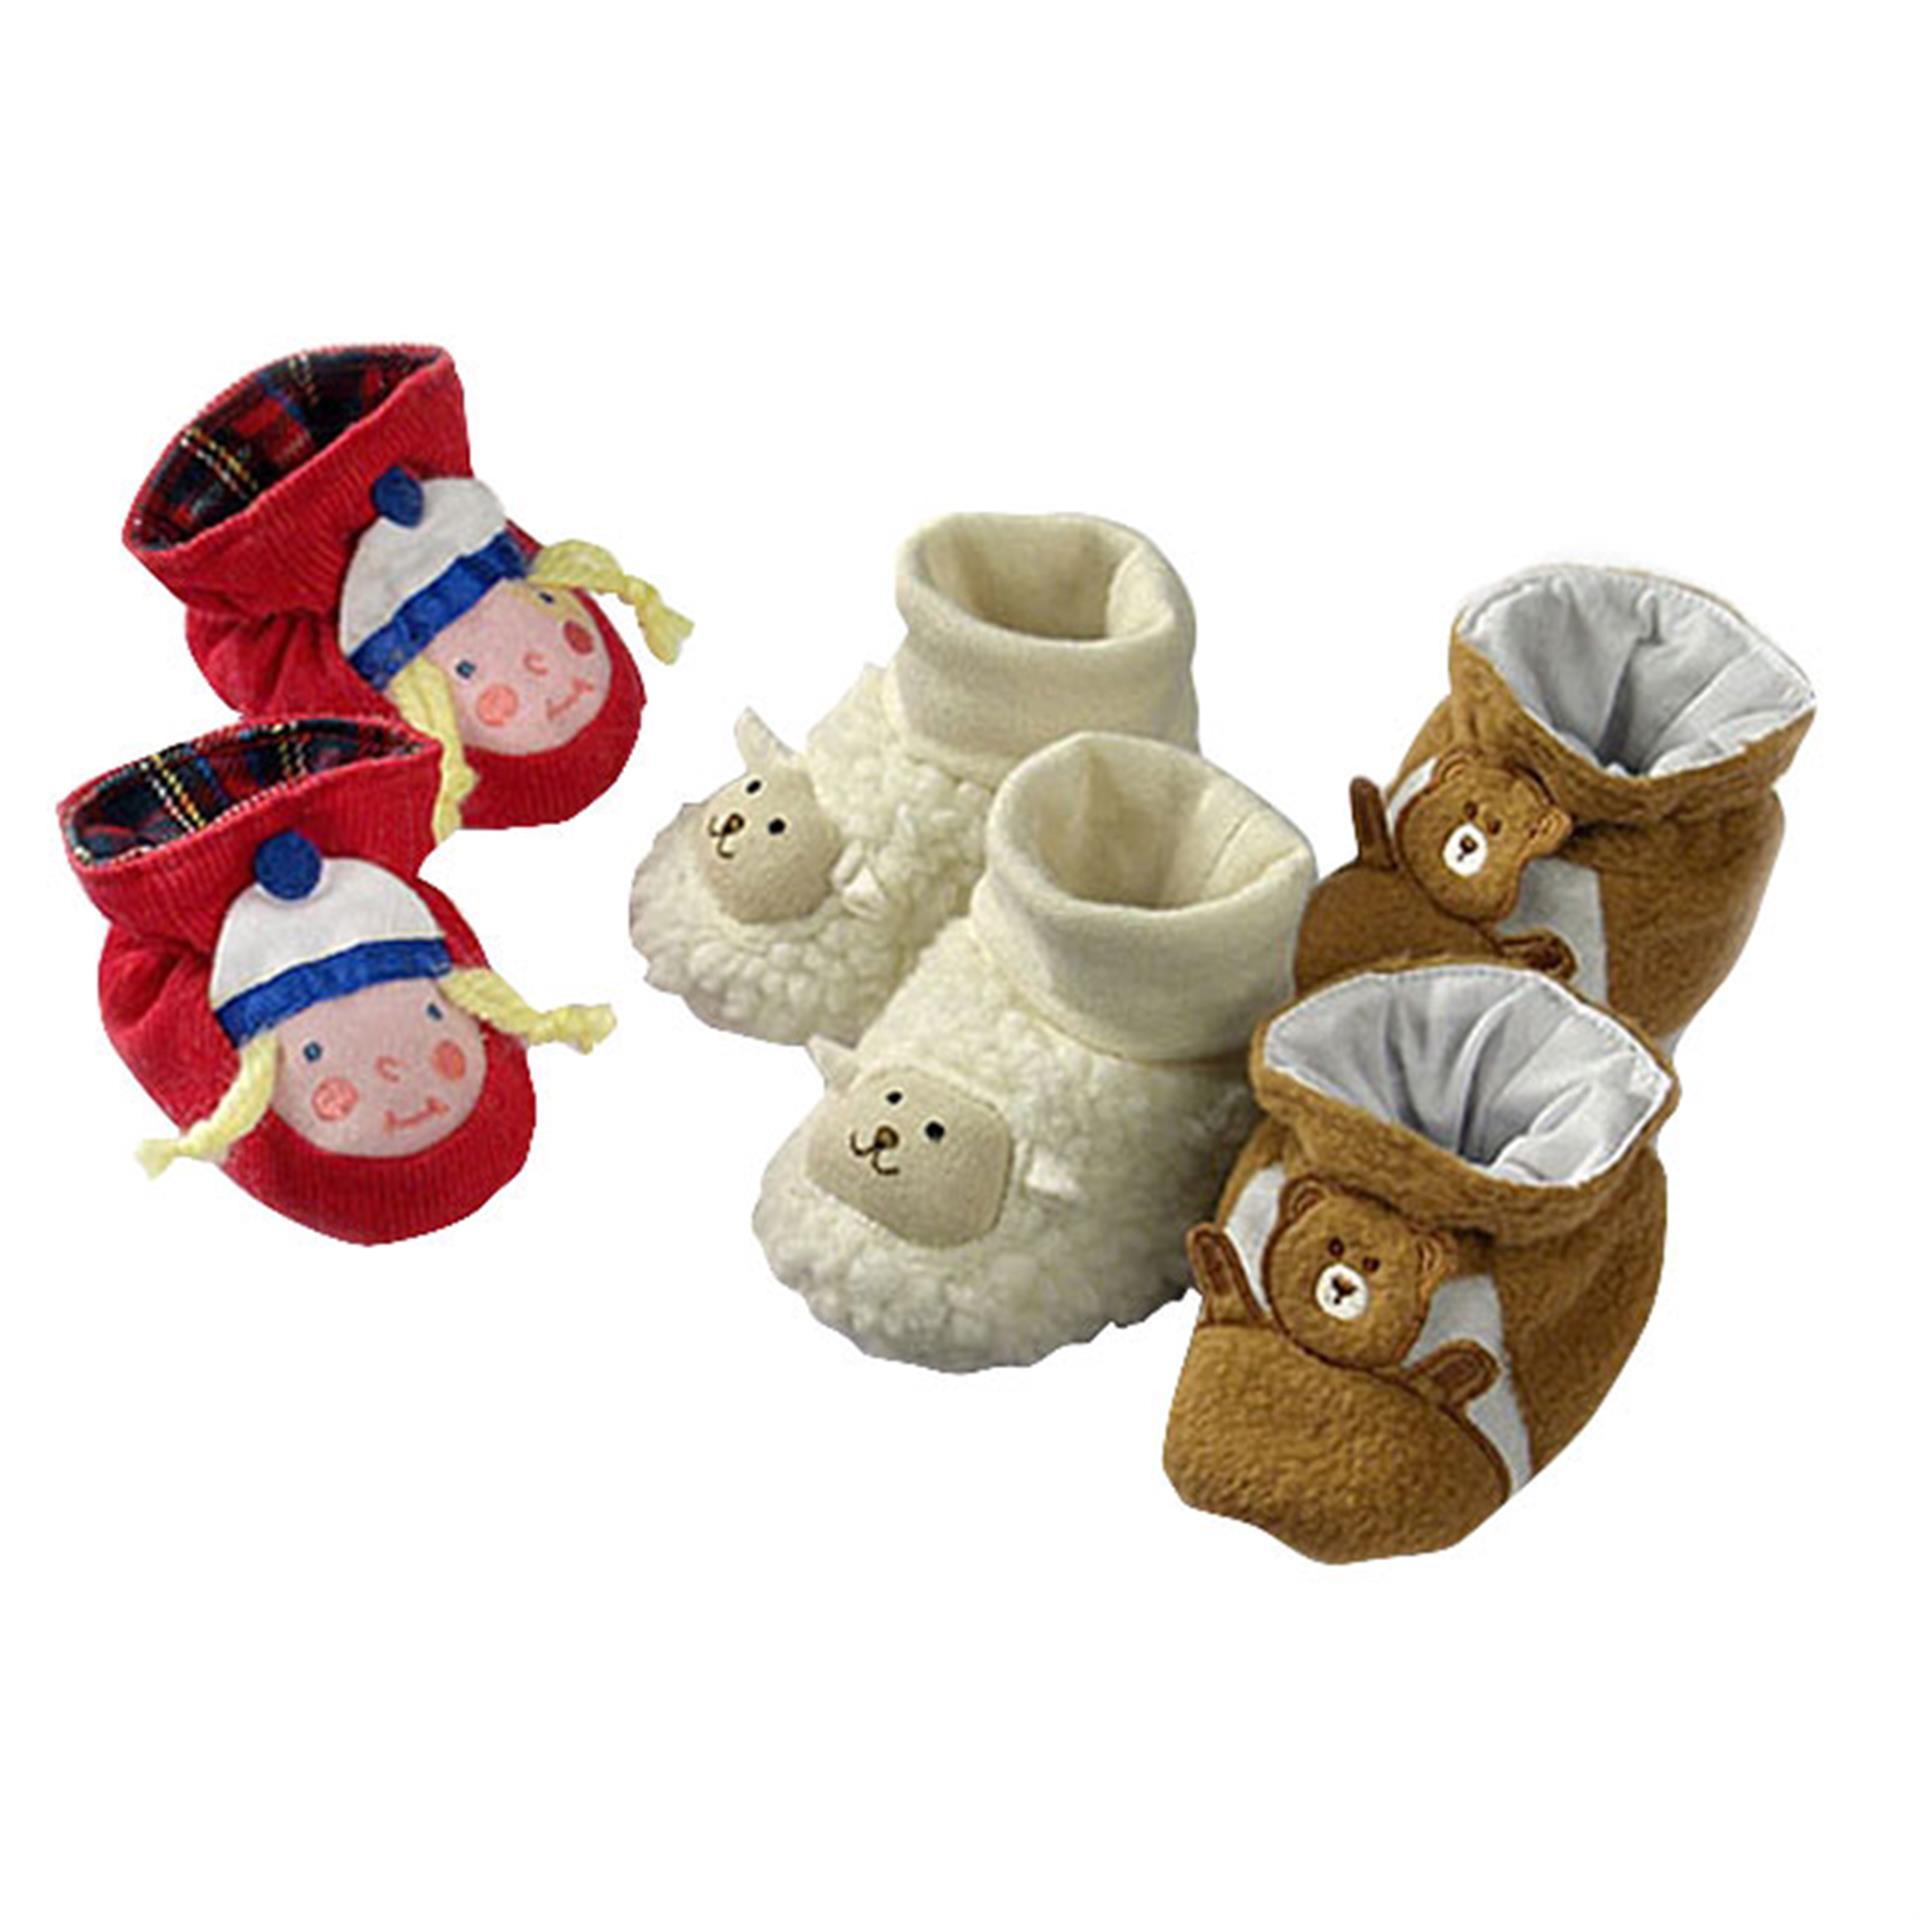 Puppen Finkli Krabbelspass 3 Paar BL